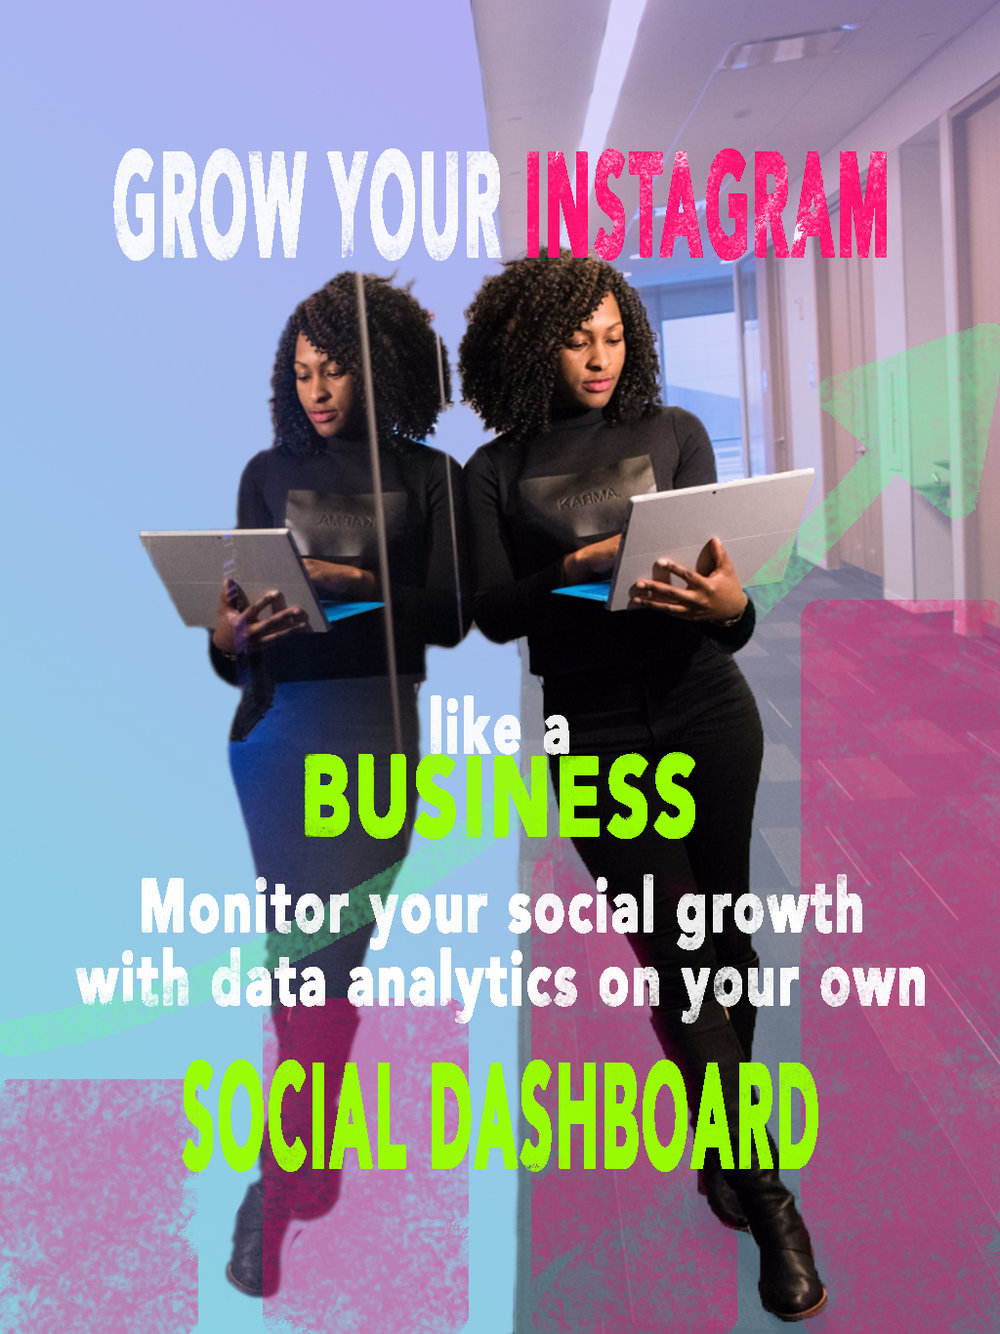 Grow your Instagram like business.jpg